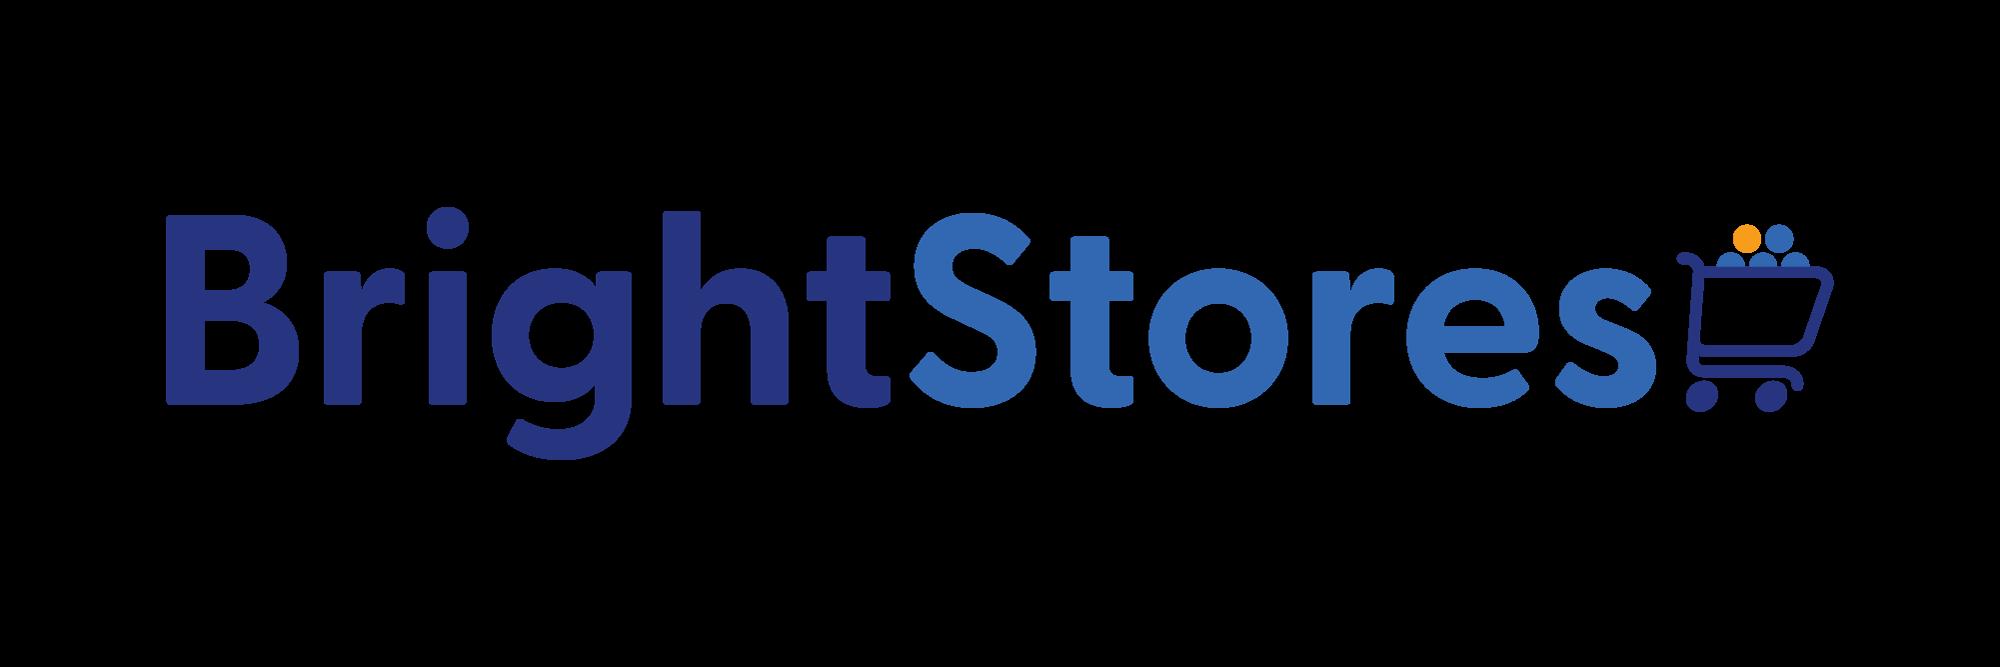 Brightstores logo.